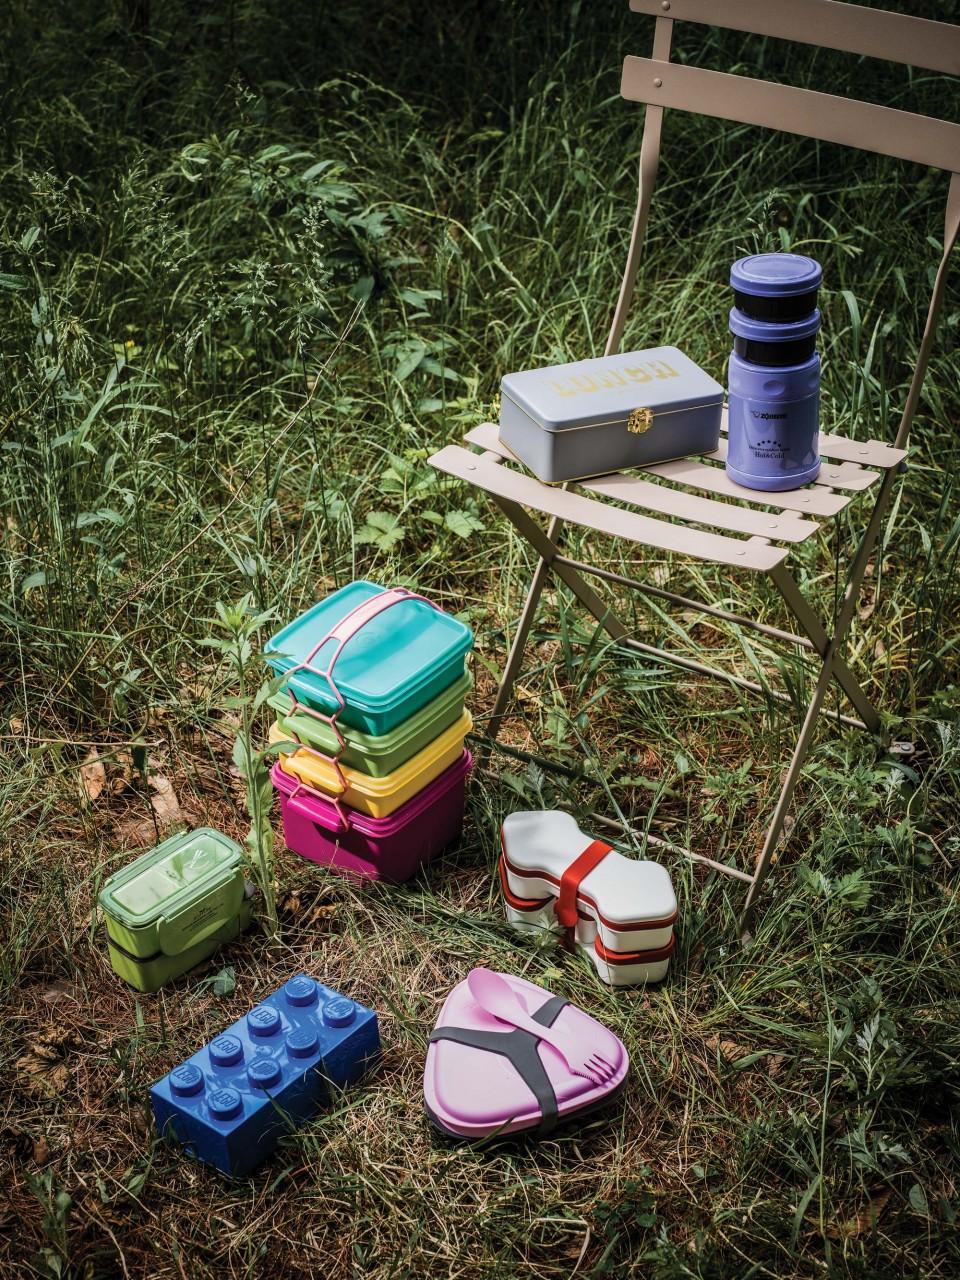 0602-picnic1-960x1280.jpg